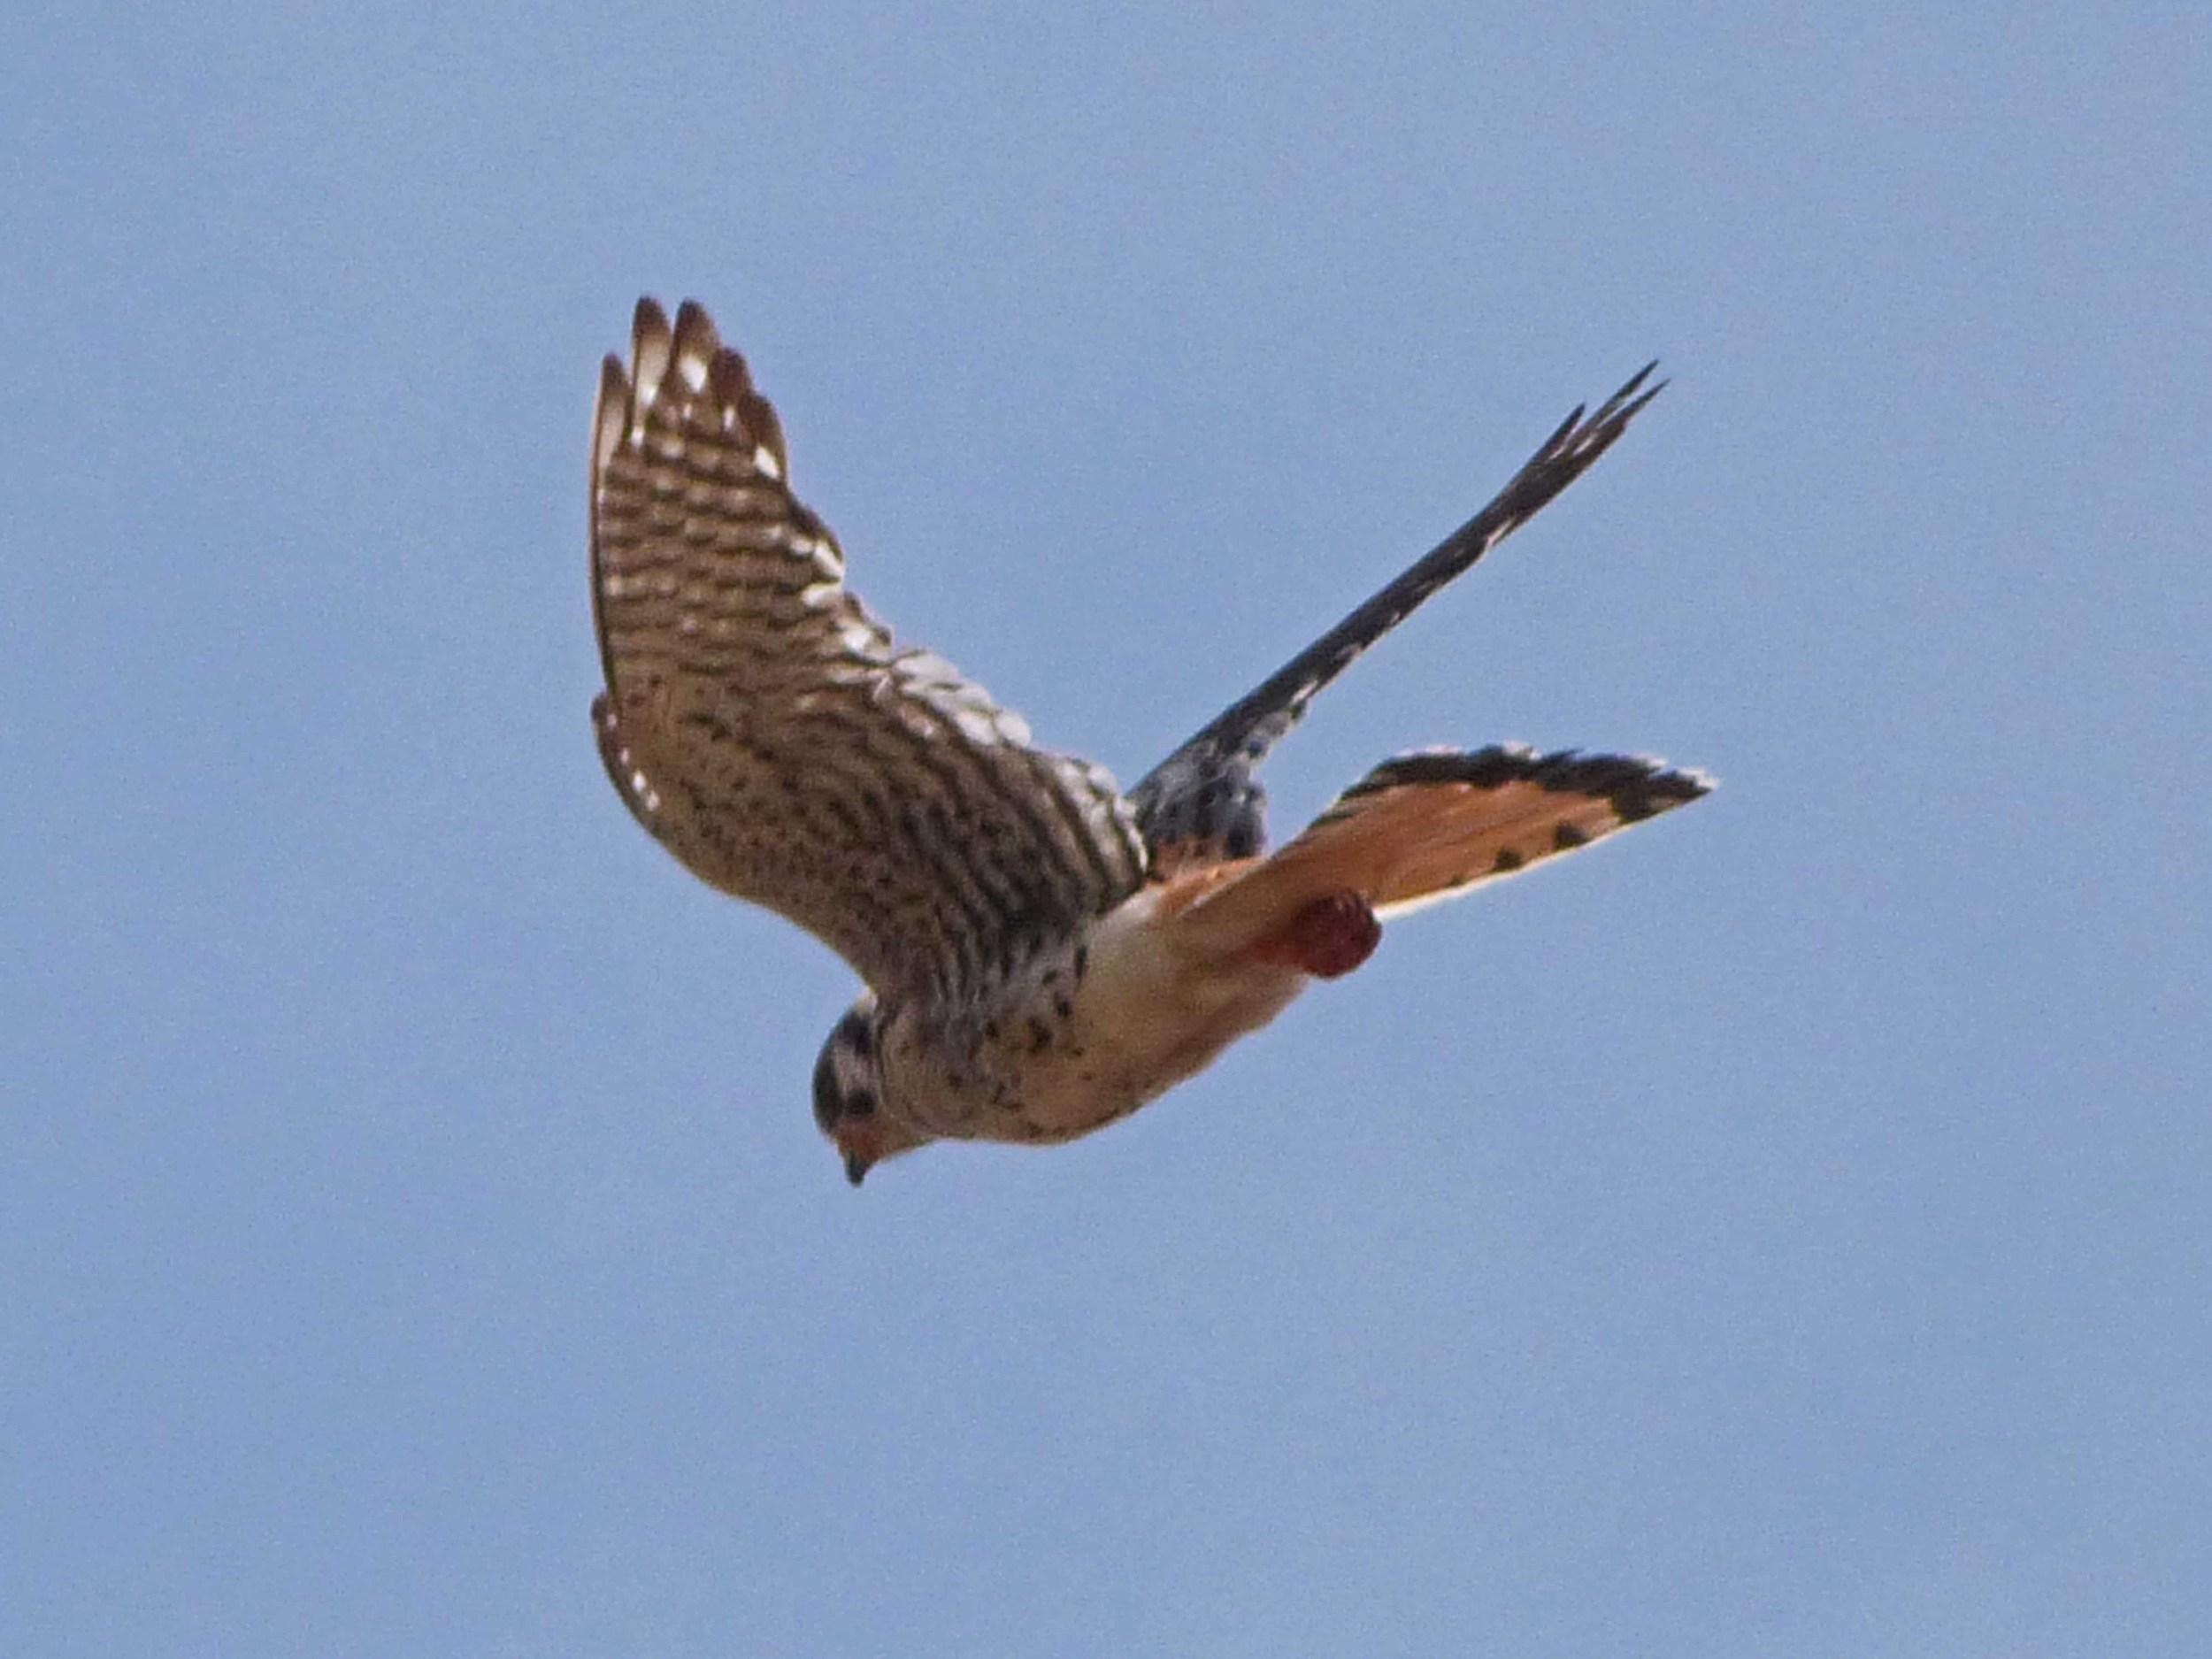 bhm P1060724 American Kestrel flying.jpg